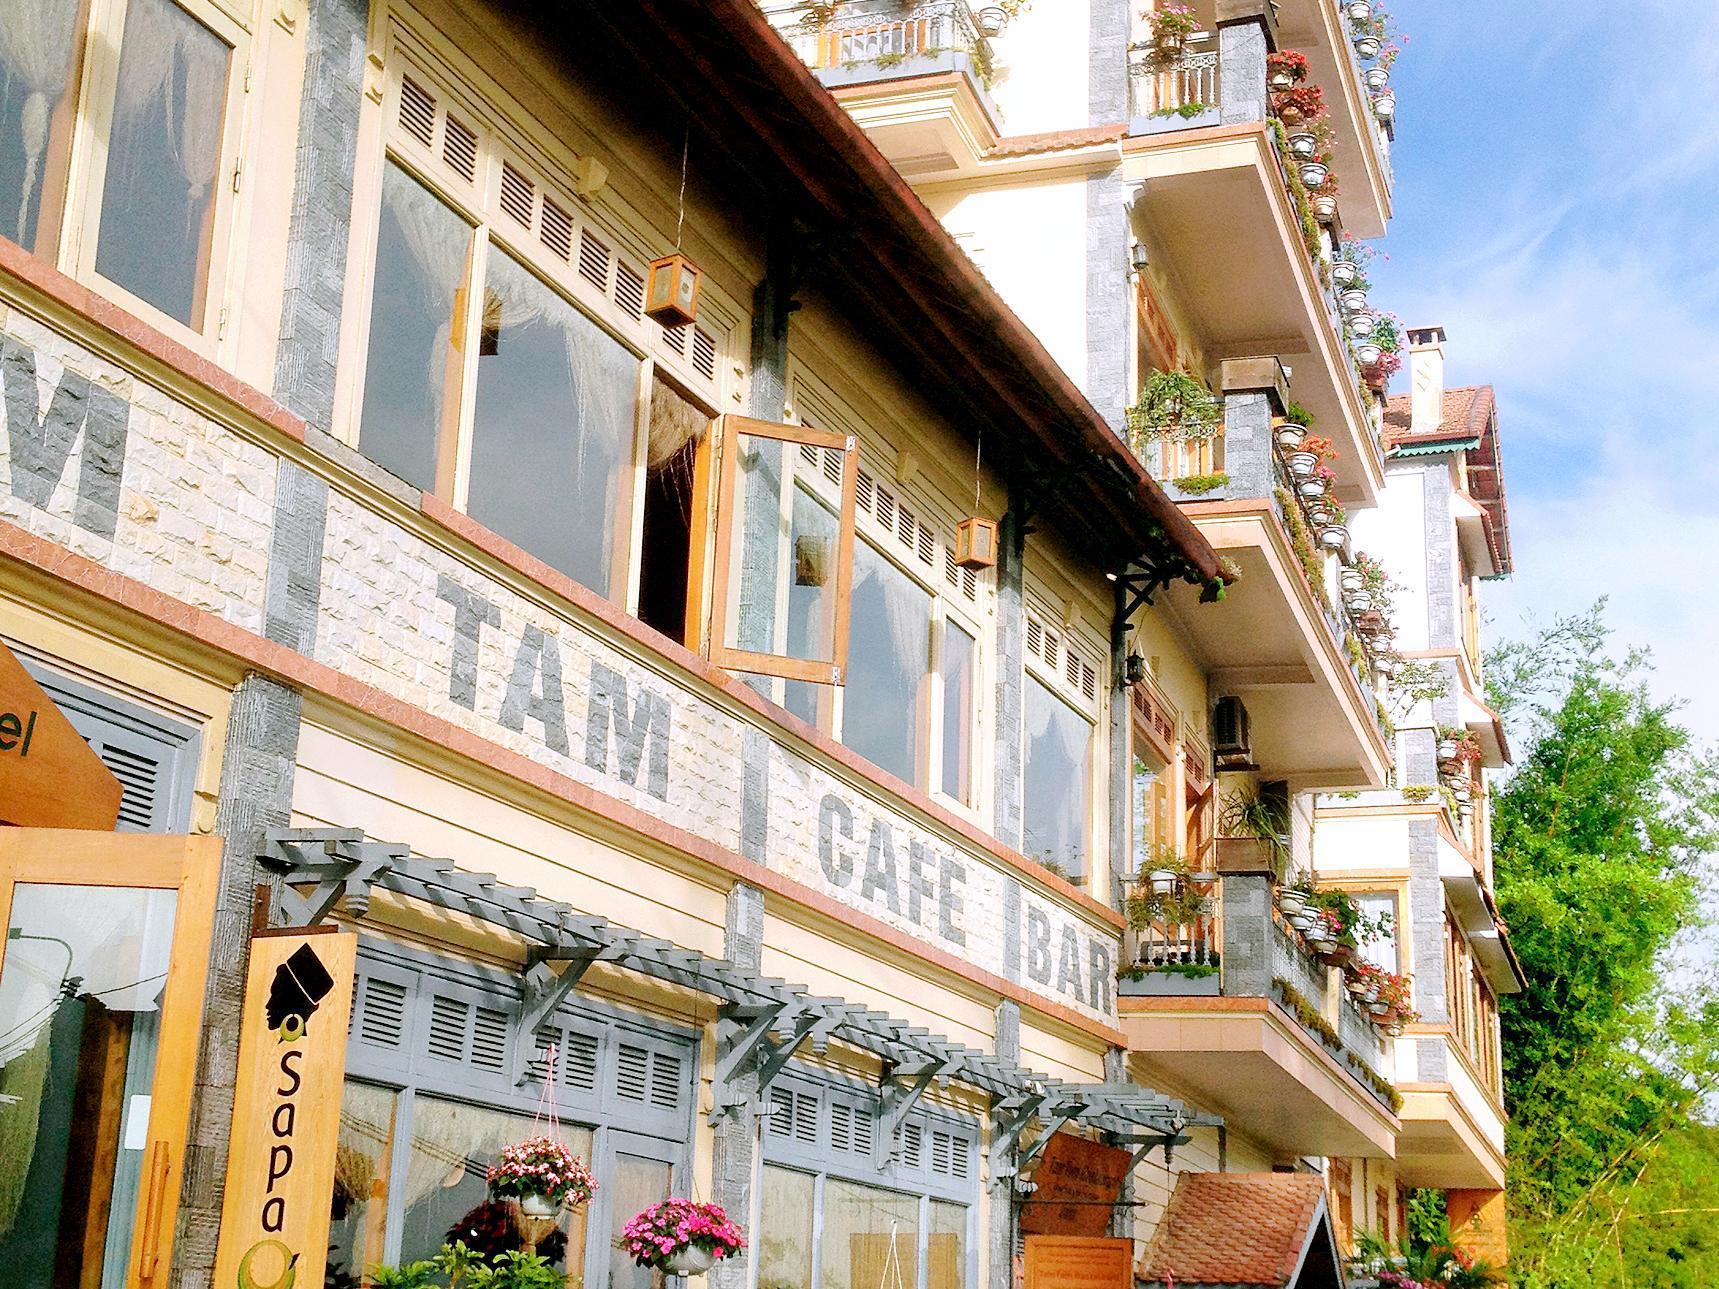 Sapa View Hotel - Hotell och Boende i Vietnam , Sapa (Lao Cai)